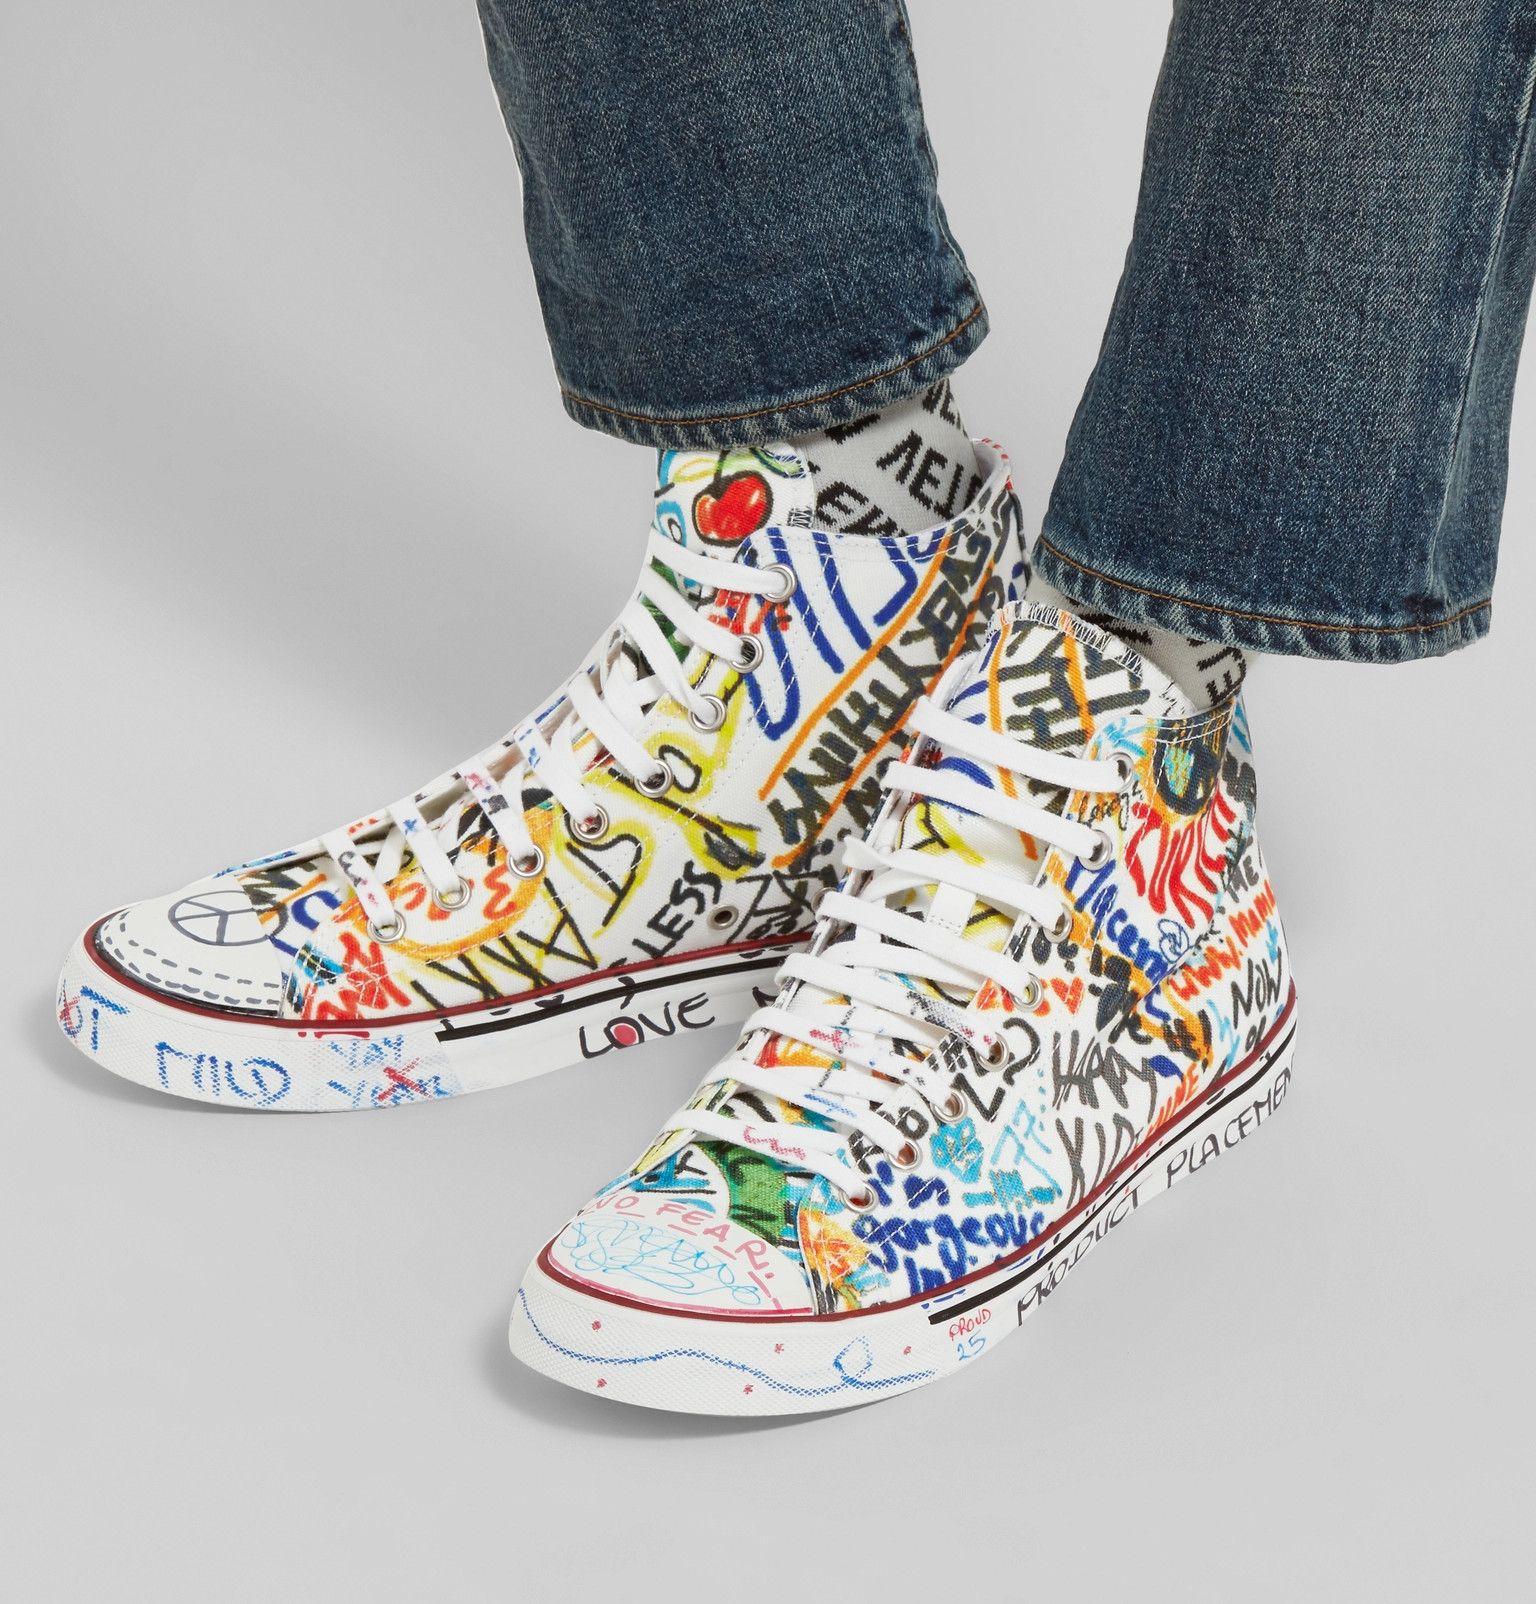 8e0e72ca4 Vetements - Printed Canvas High-Top Sneakers | Men's Fashion in 2019 ...